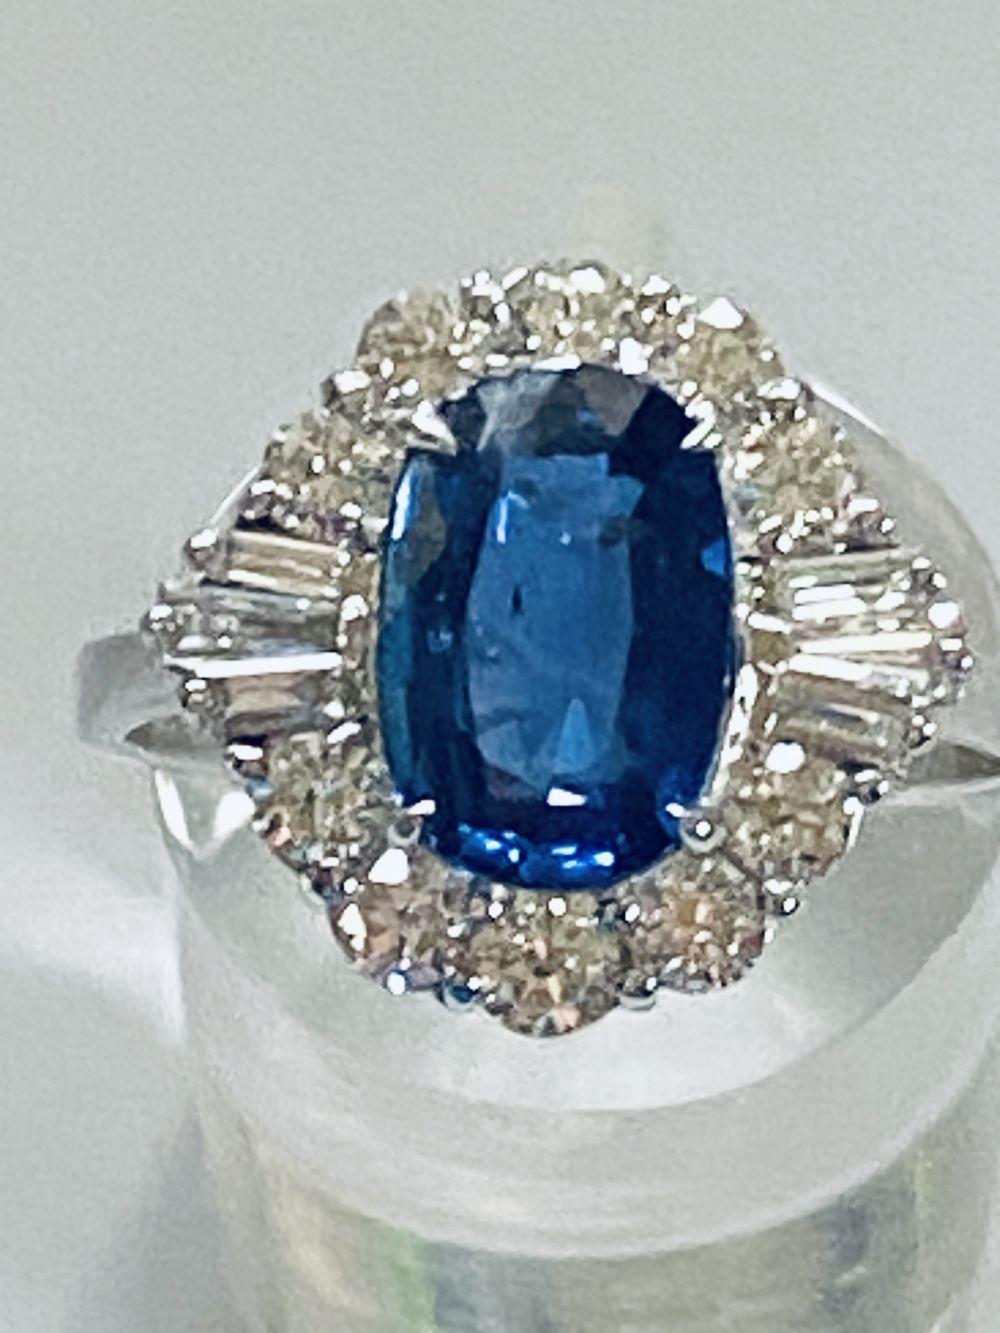 ART DECO DIAMOND AND CEYLON SAPPHIRE CLUSTER RING - Image 2 of 7